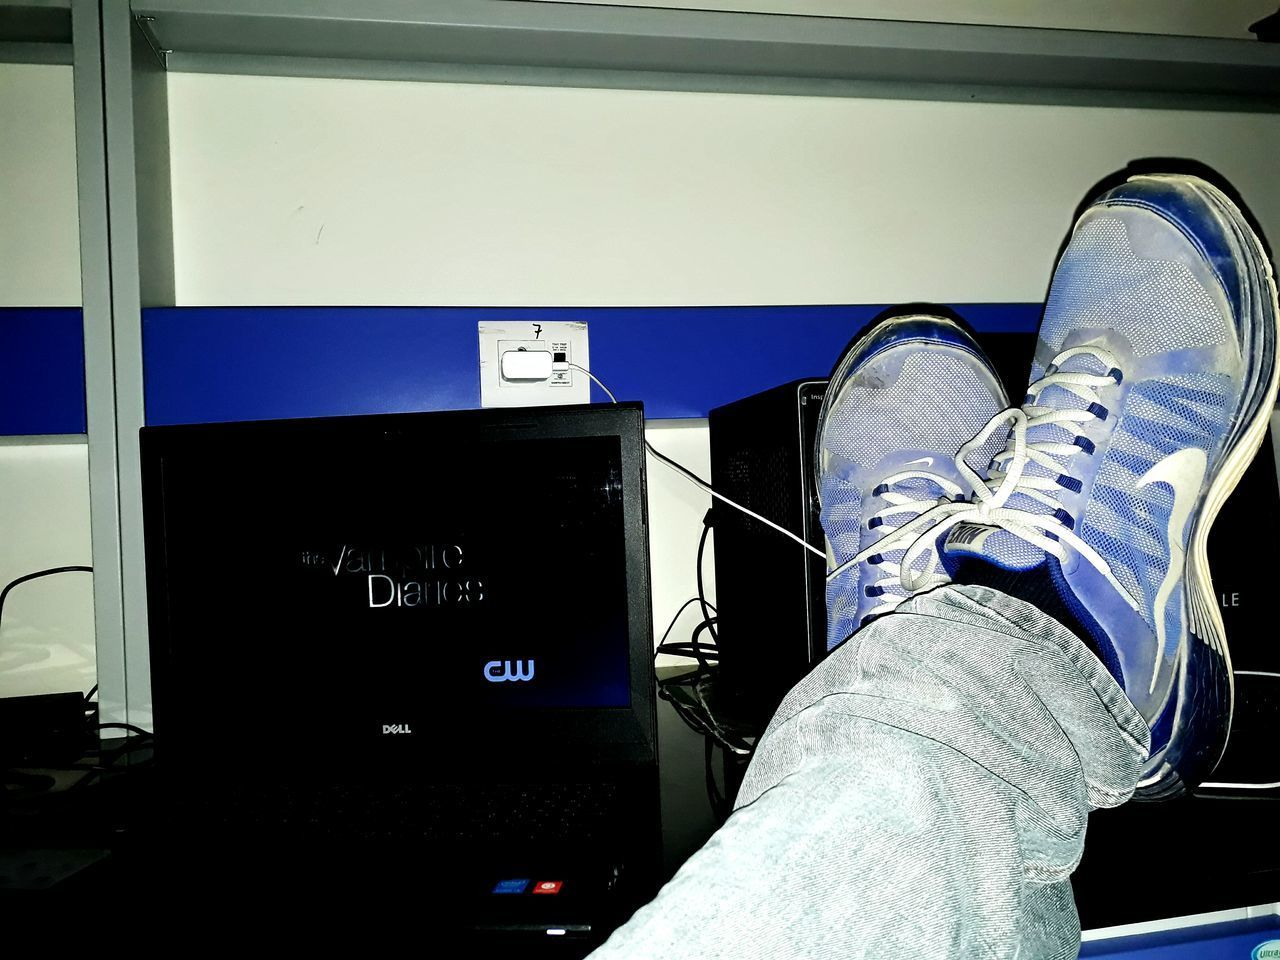 Out Of The Box Shoe Enjoying Nike Vampire Diaries Watching At Work Time Pass